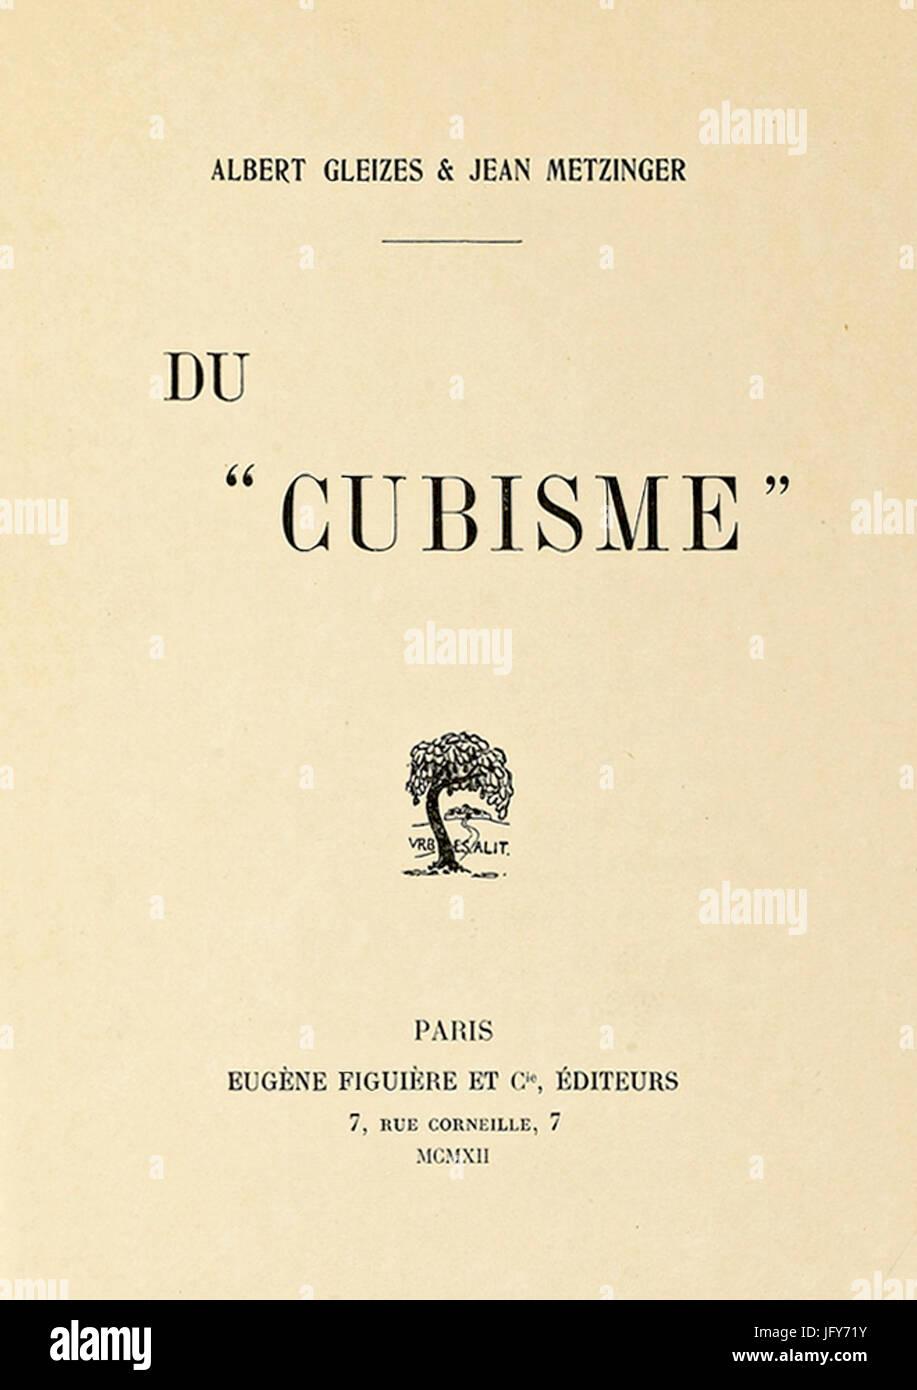 Du 2ubisme , 1912, Jean Metzinger, Albert Gleizes, Eugène Figuière Editeurs (cover) - Stock Image